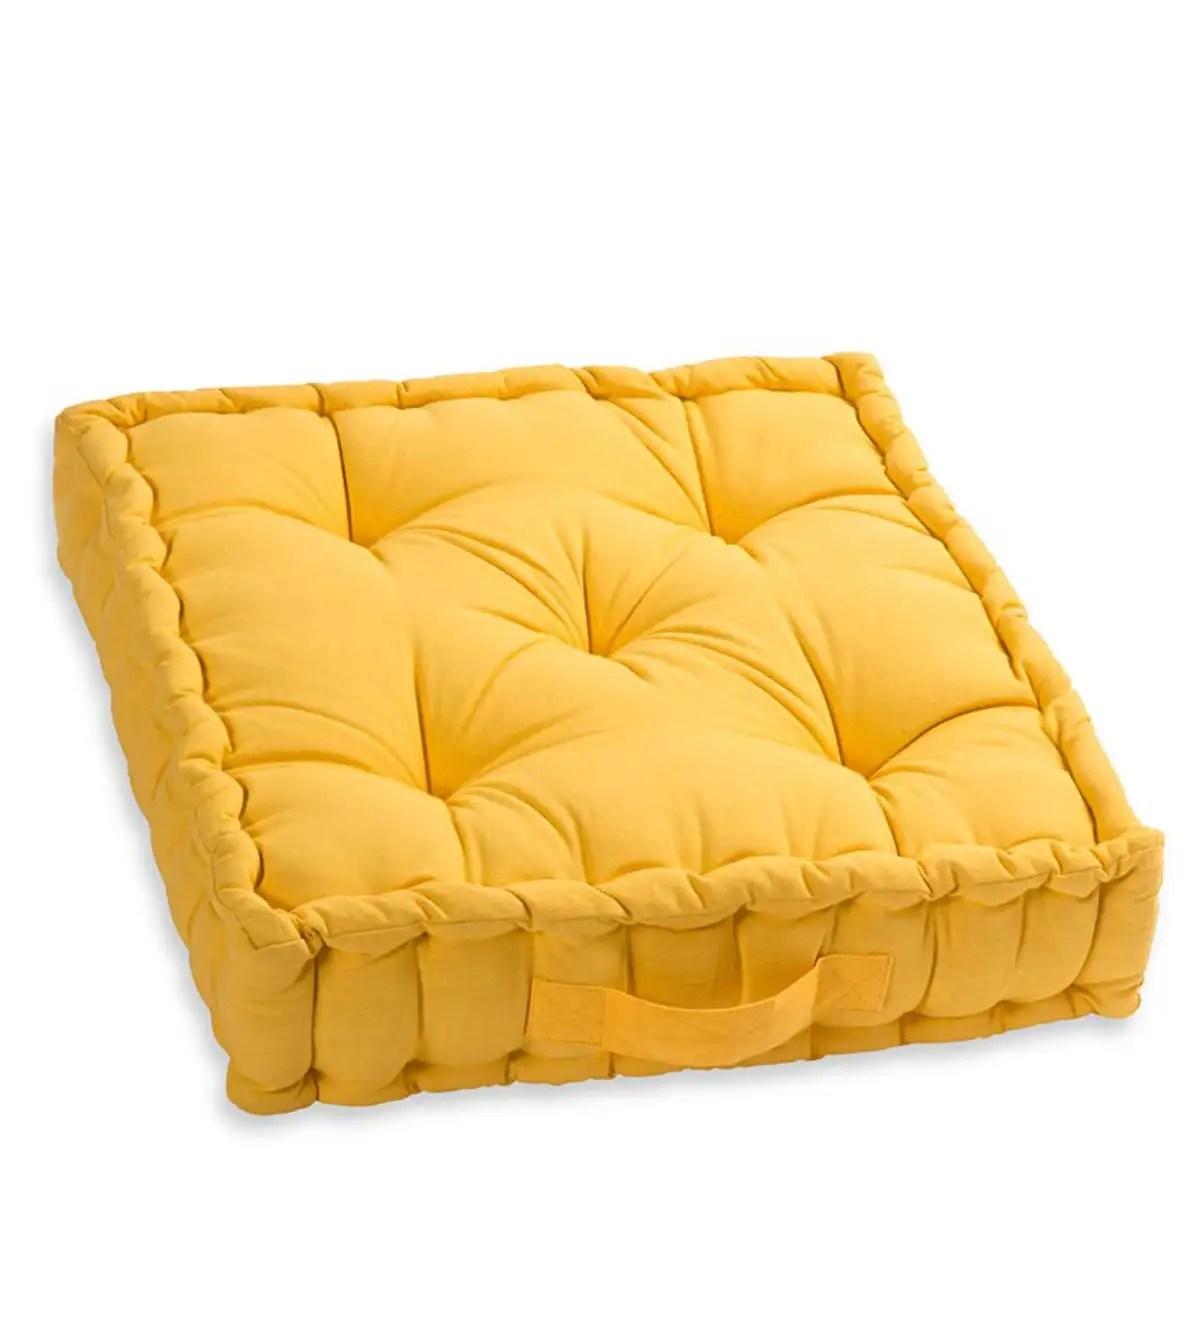 colorful tufted floor cushion plowhearth